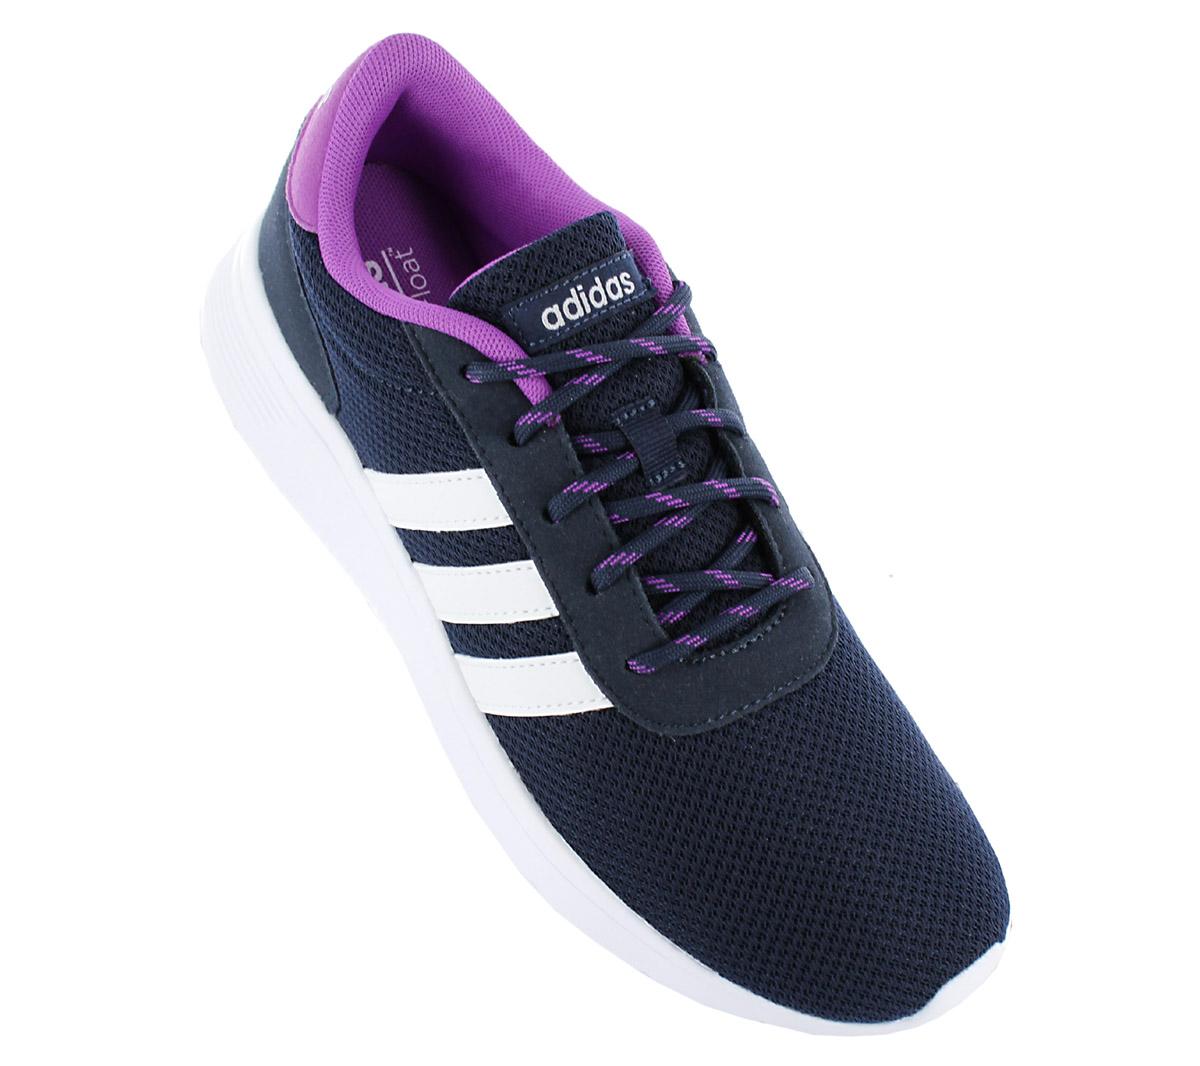 adidas Damen Sneaker Lite Racer W Schuhe Navy-Blau Turnschuhe Freizeit NEU 9833